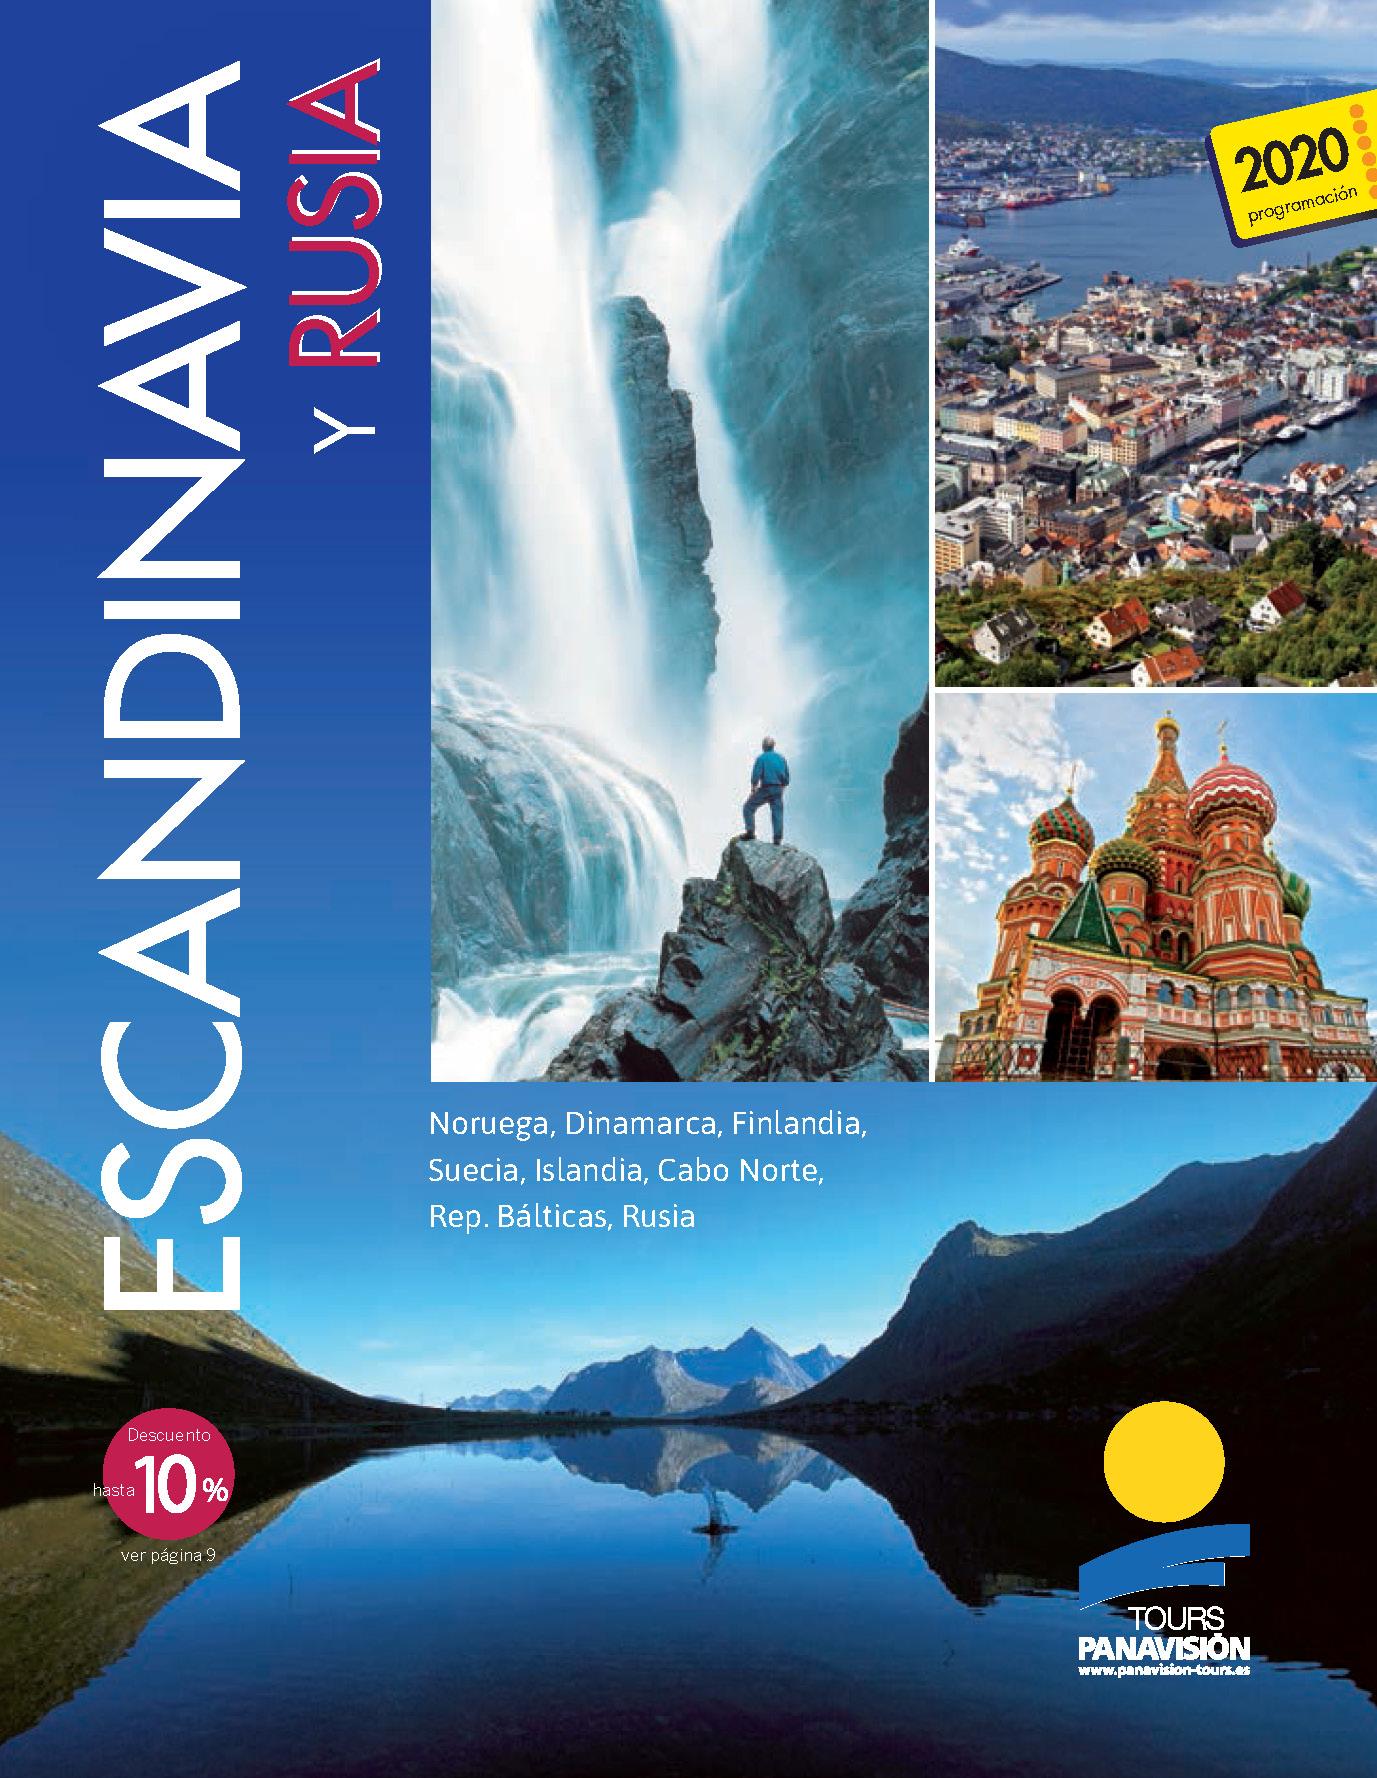 Catalogo Panavision Tours Escandinavia y Rusia 2020 FE0